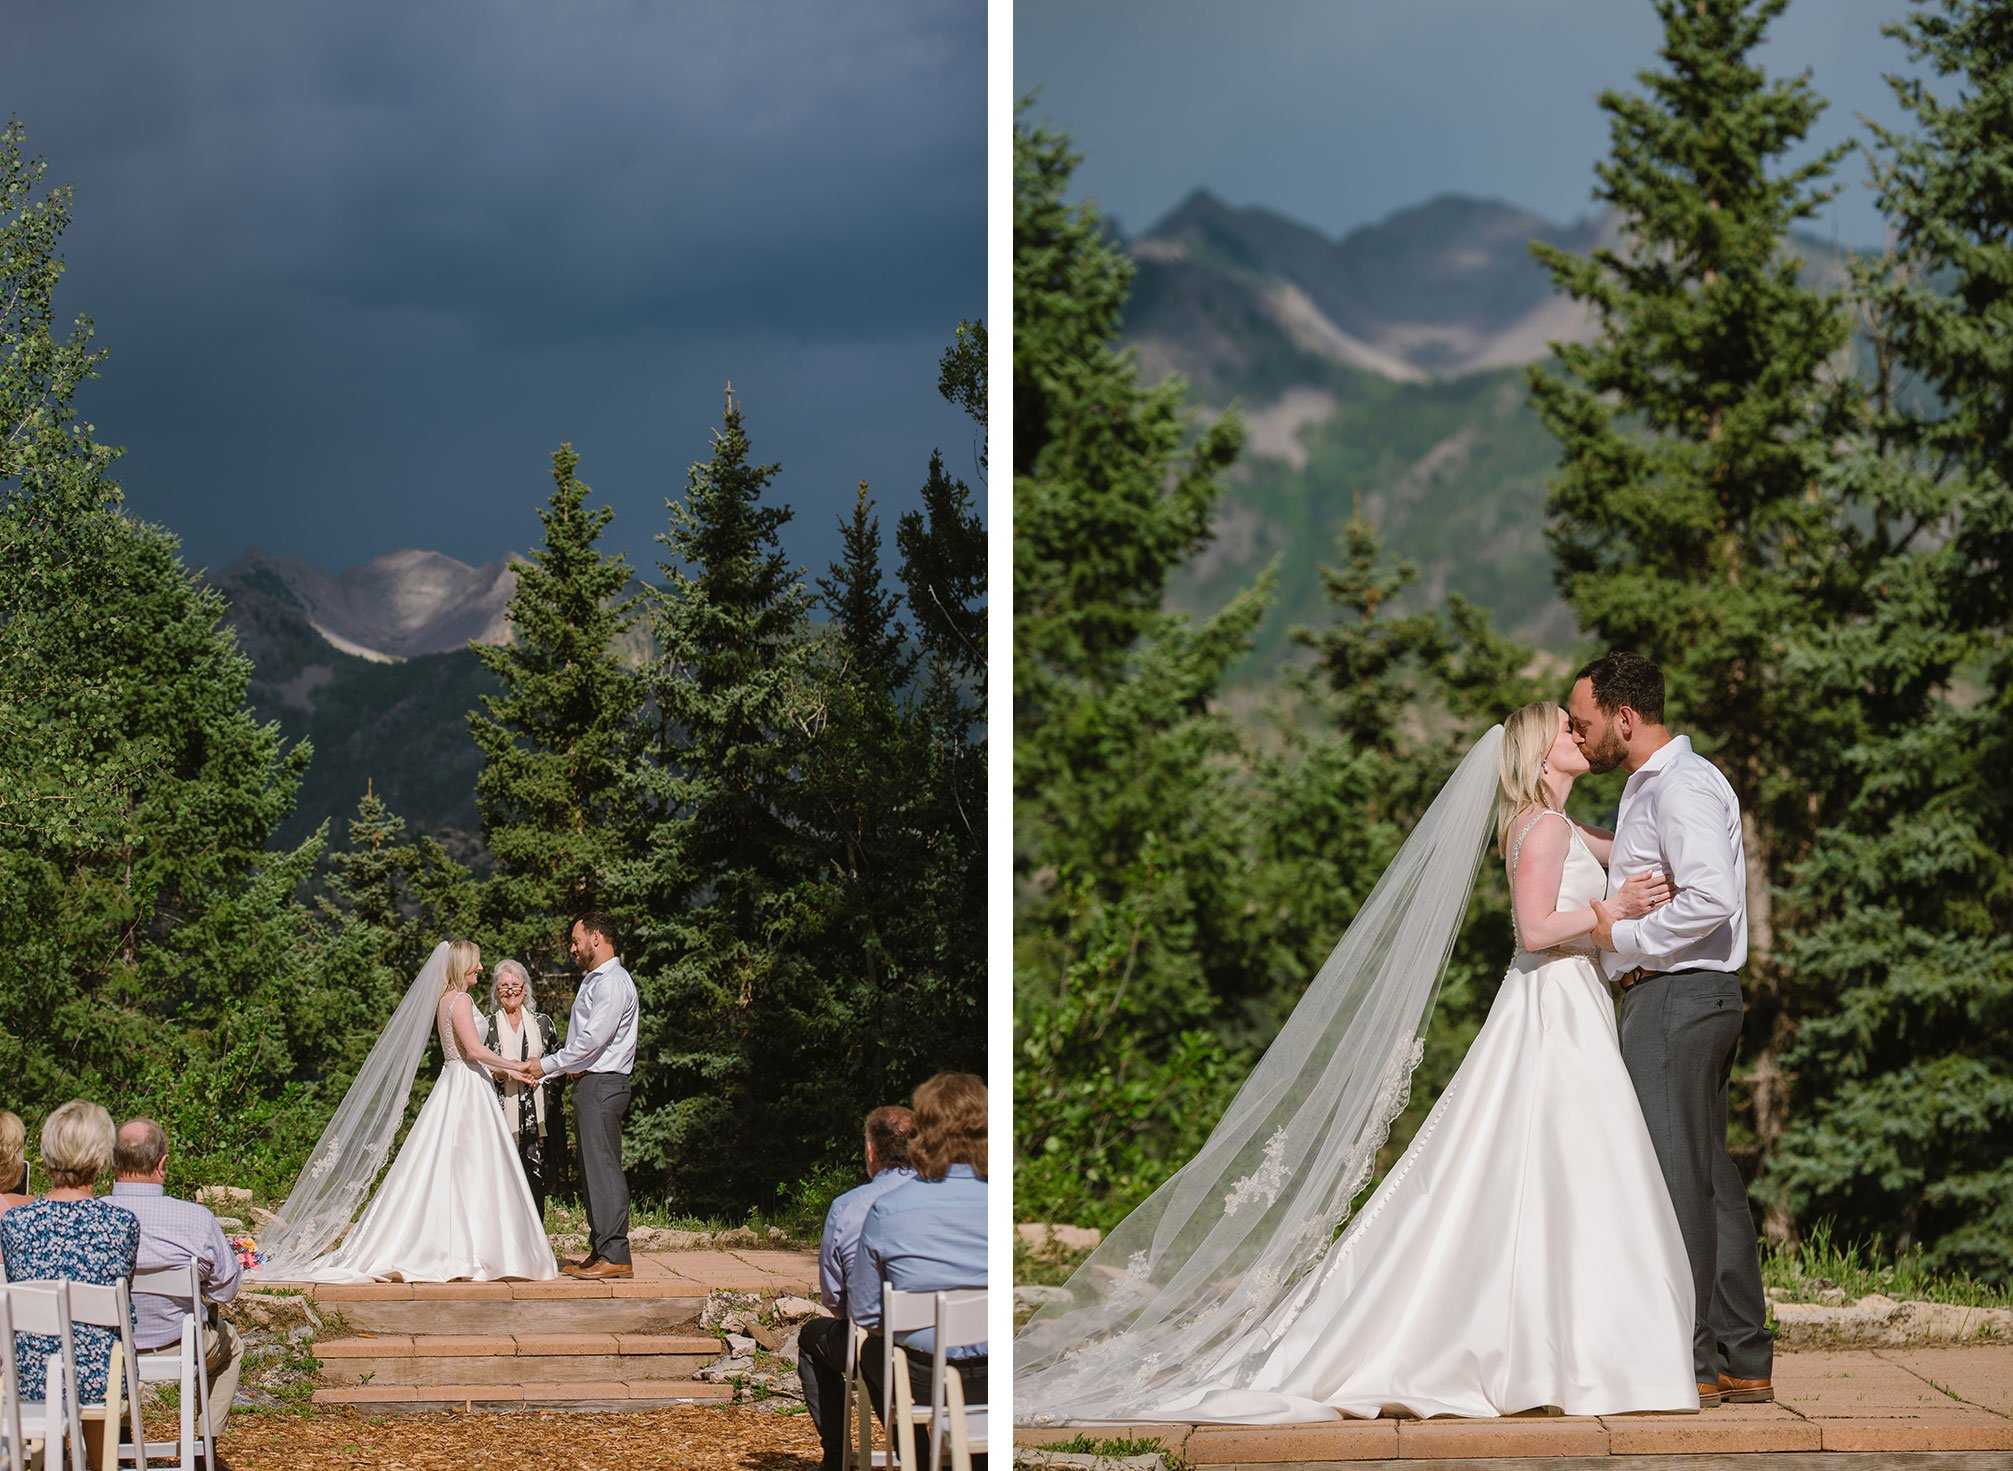 Ceremony at Purgatory Resort, Durango Colorado